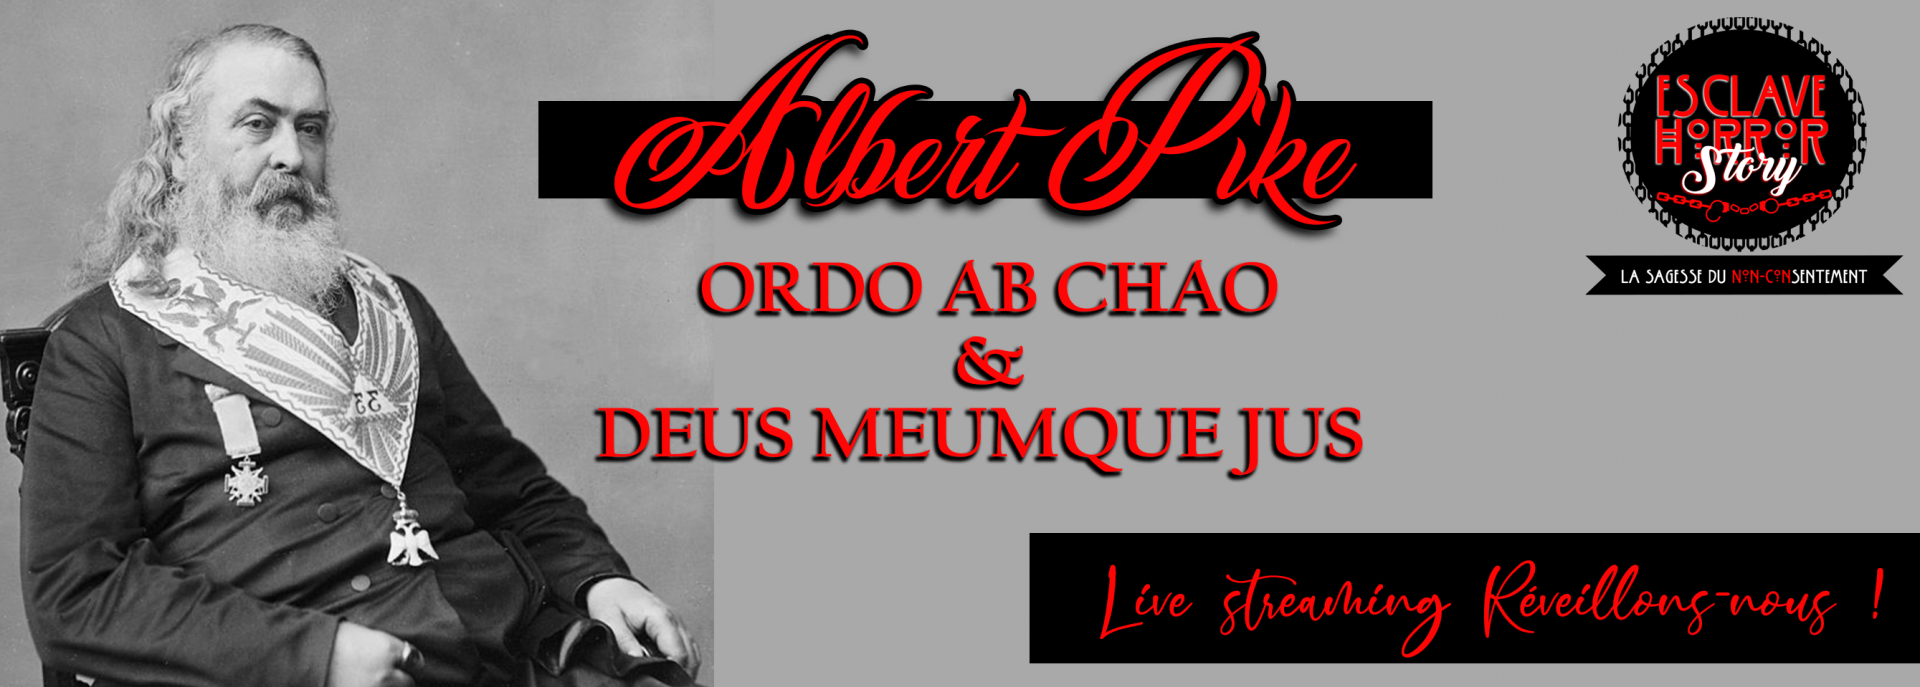 Albert pike ordo ab chao